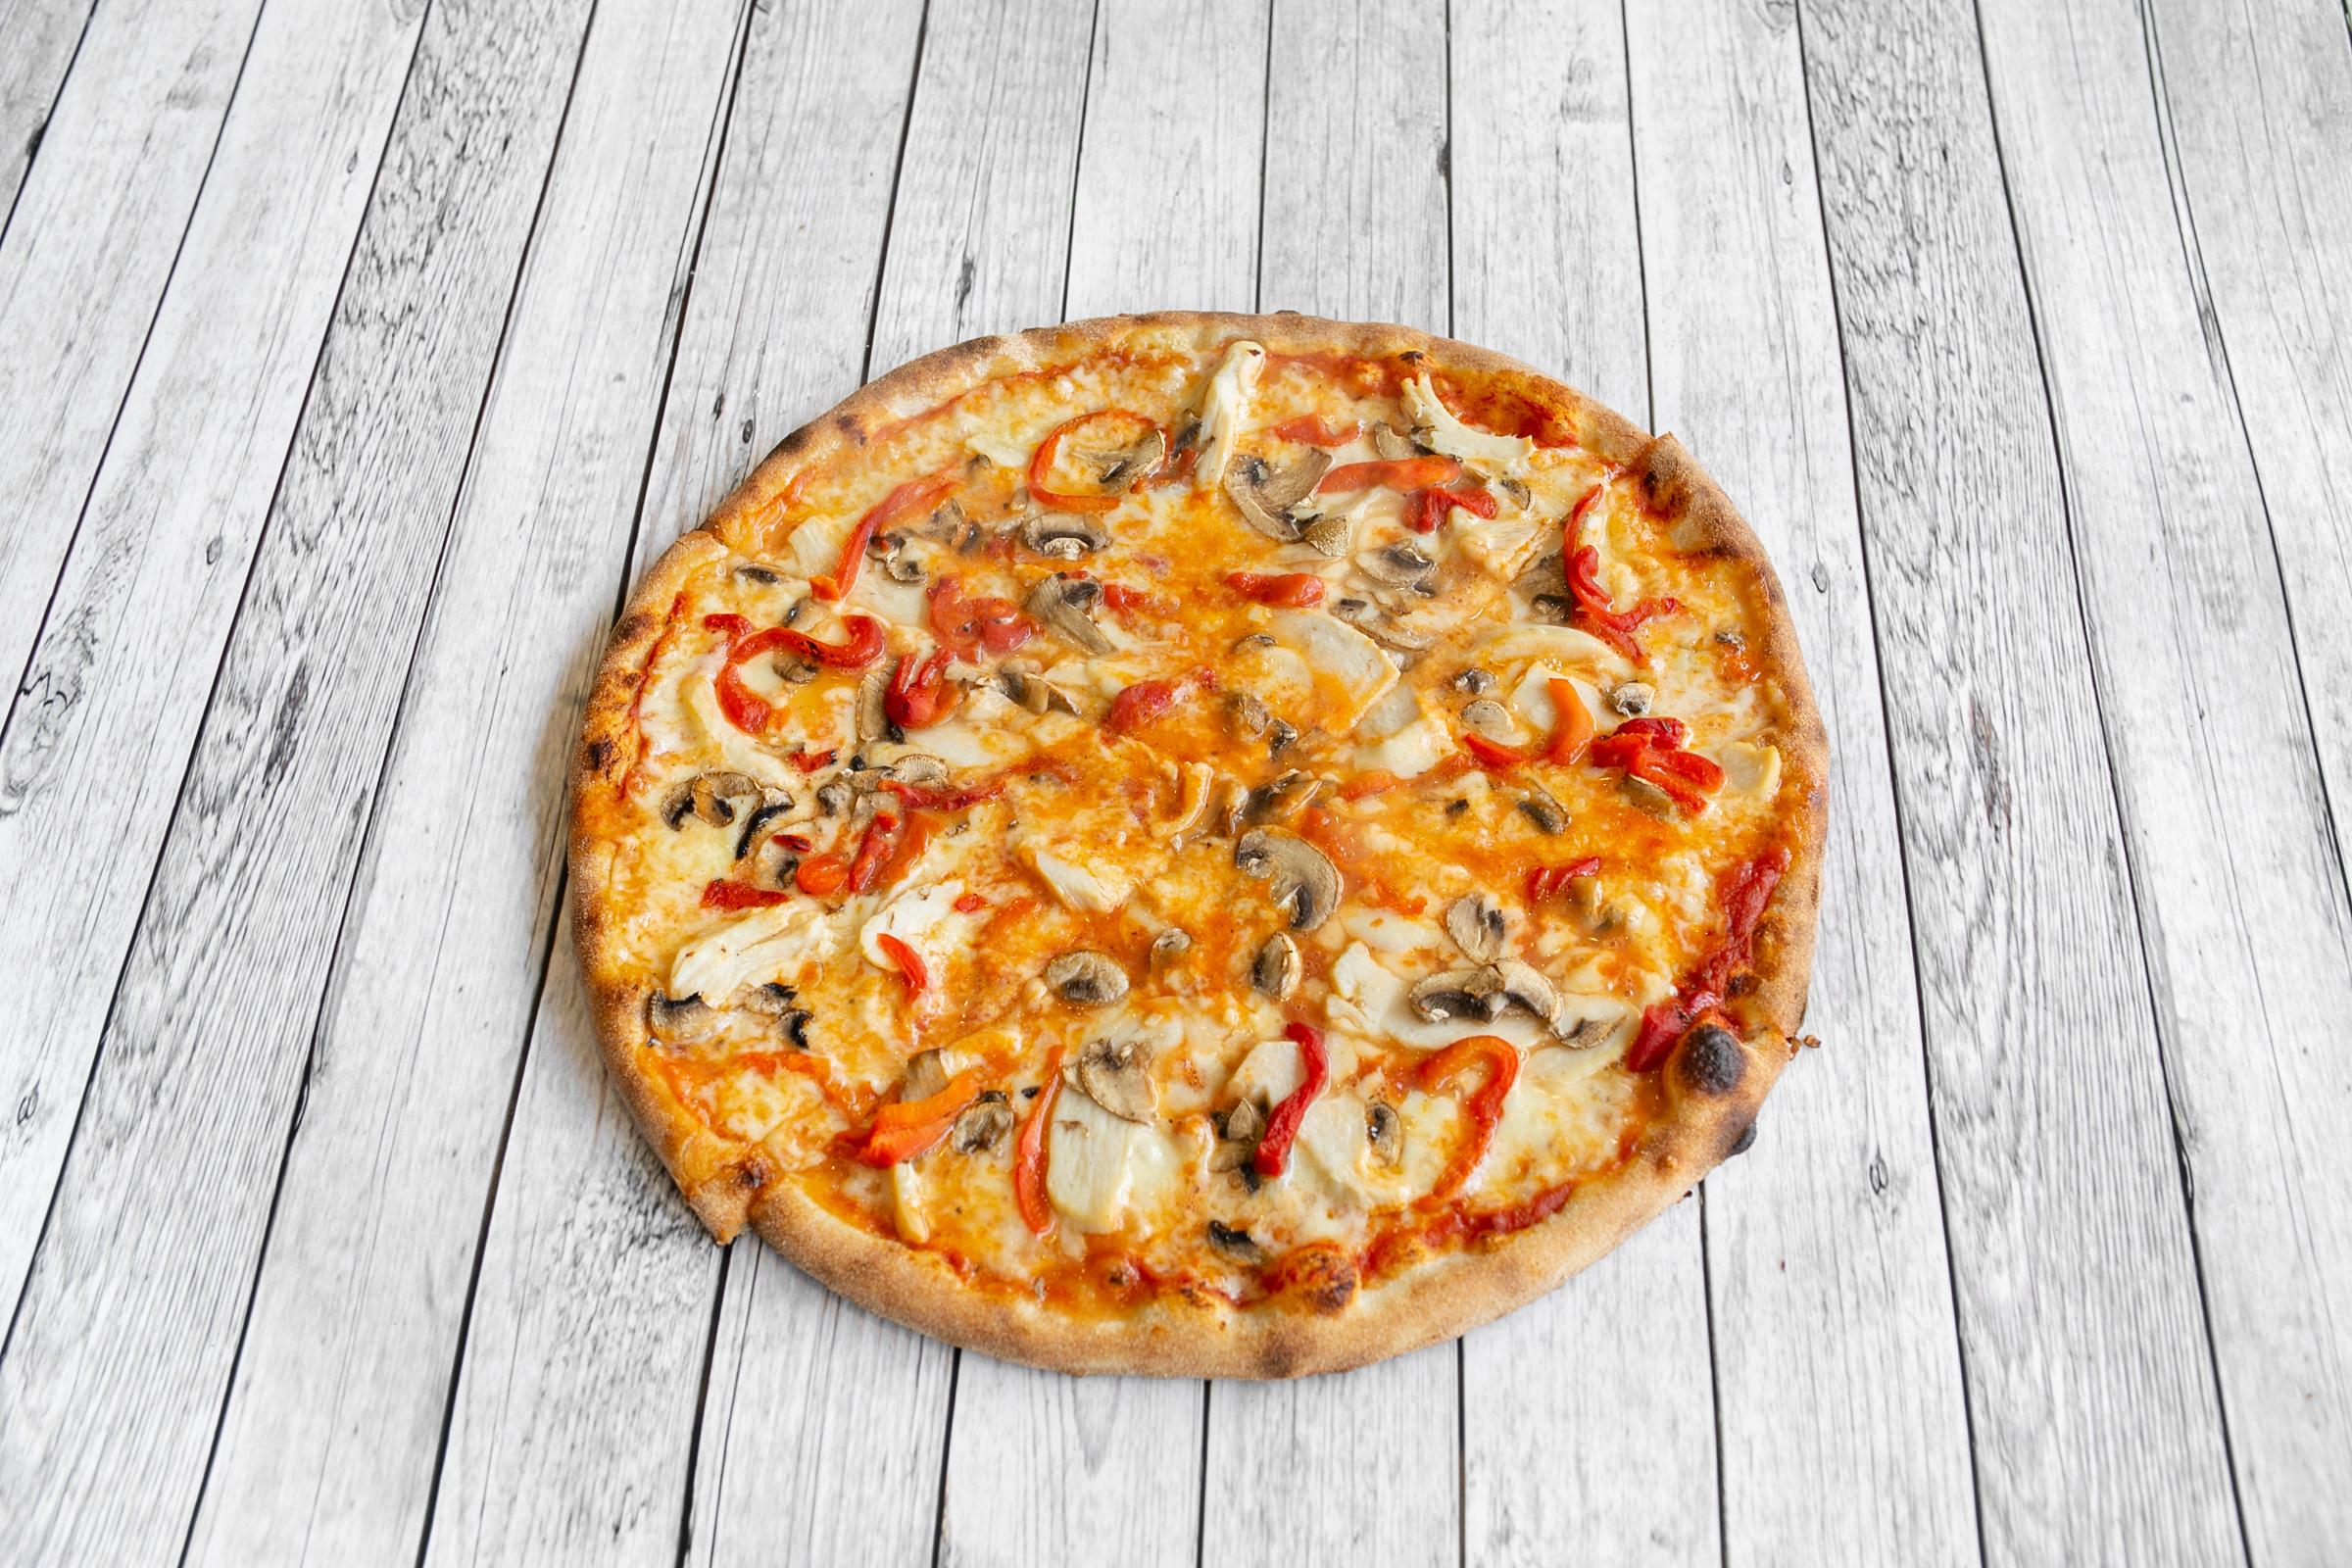 Pizza from Caloroso in Beckton